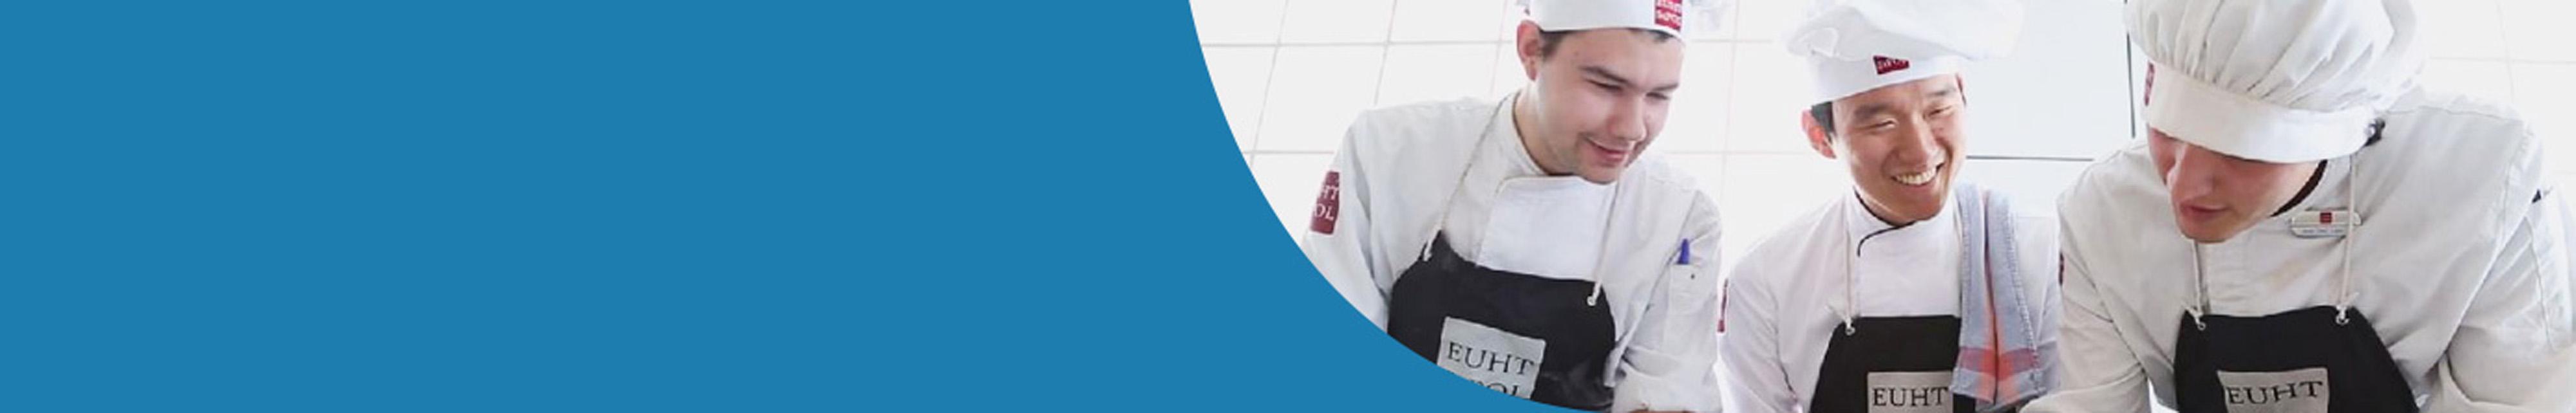 banner-alumni